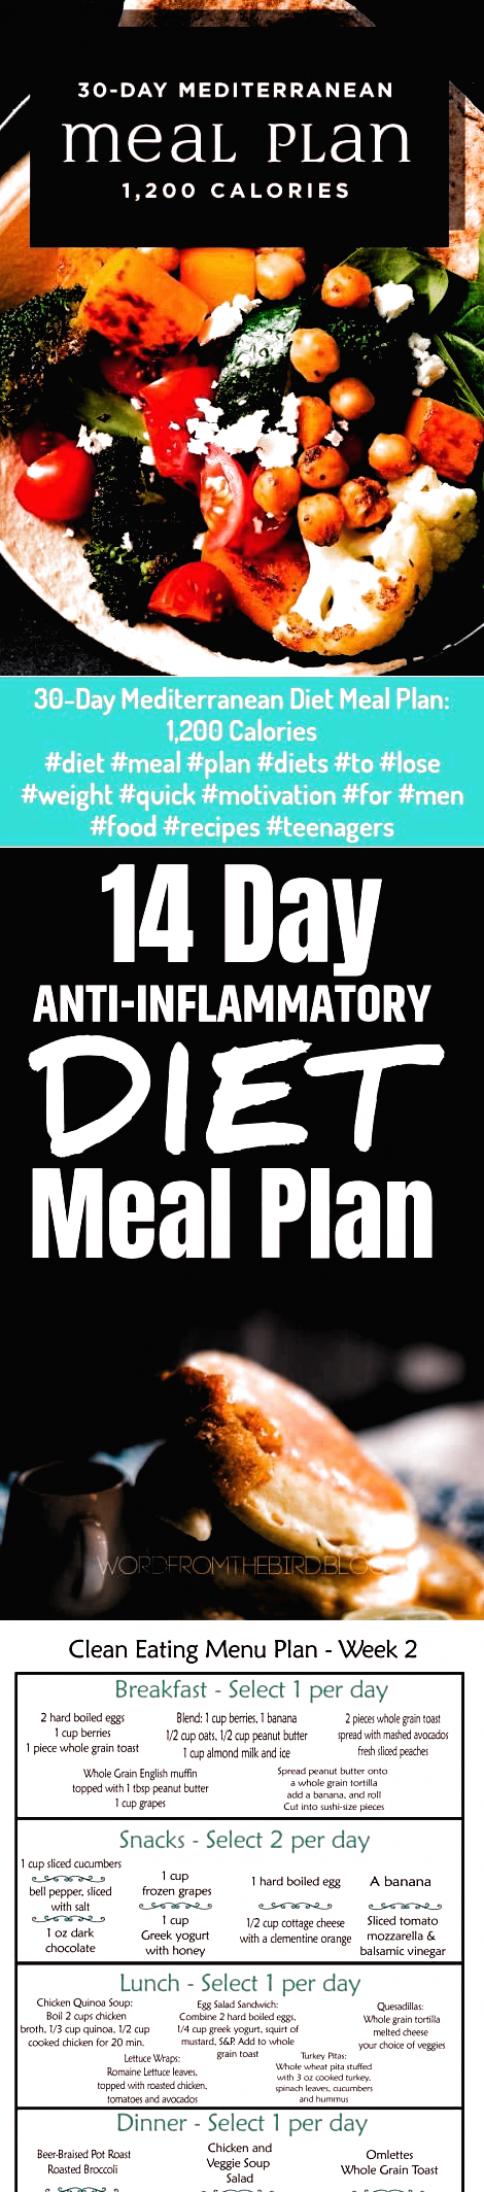 Diet 30 Day Mediterranean Diet Meal Plan 1200 Calories Diet Meal Plan Diets T In 2020 Anti Inflammatory Diet Meal Plan Easy Diet Plan Mediterranean Diet Recipes